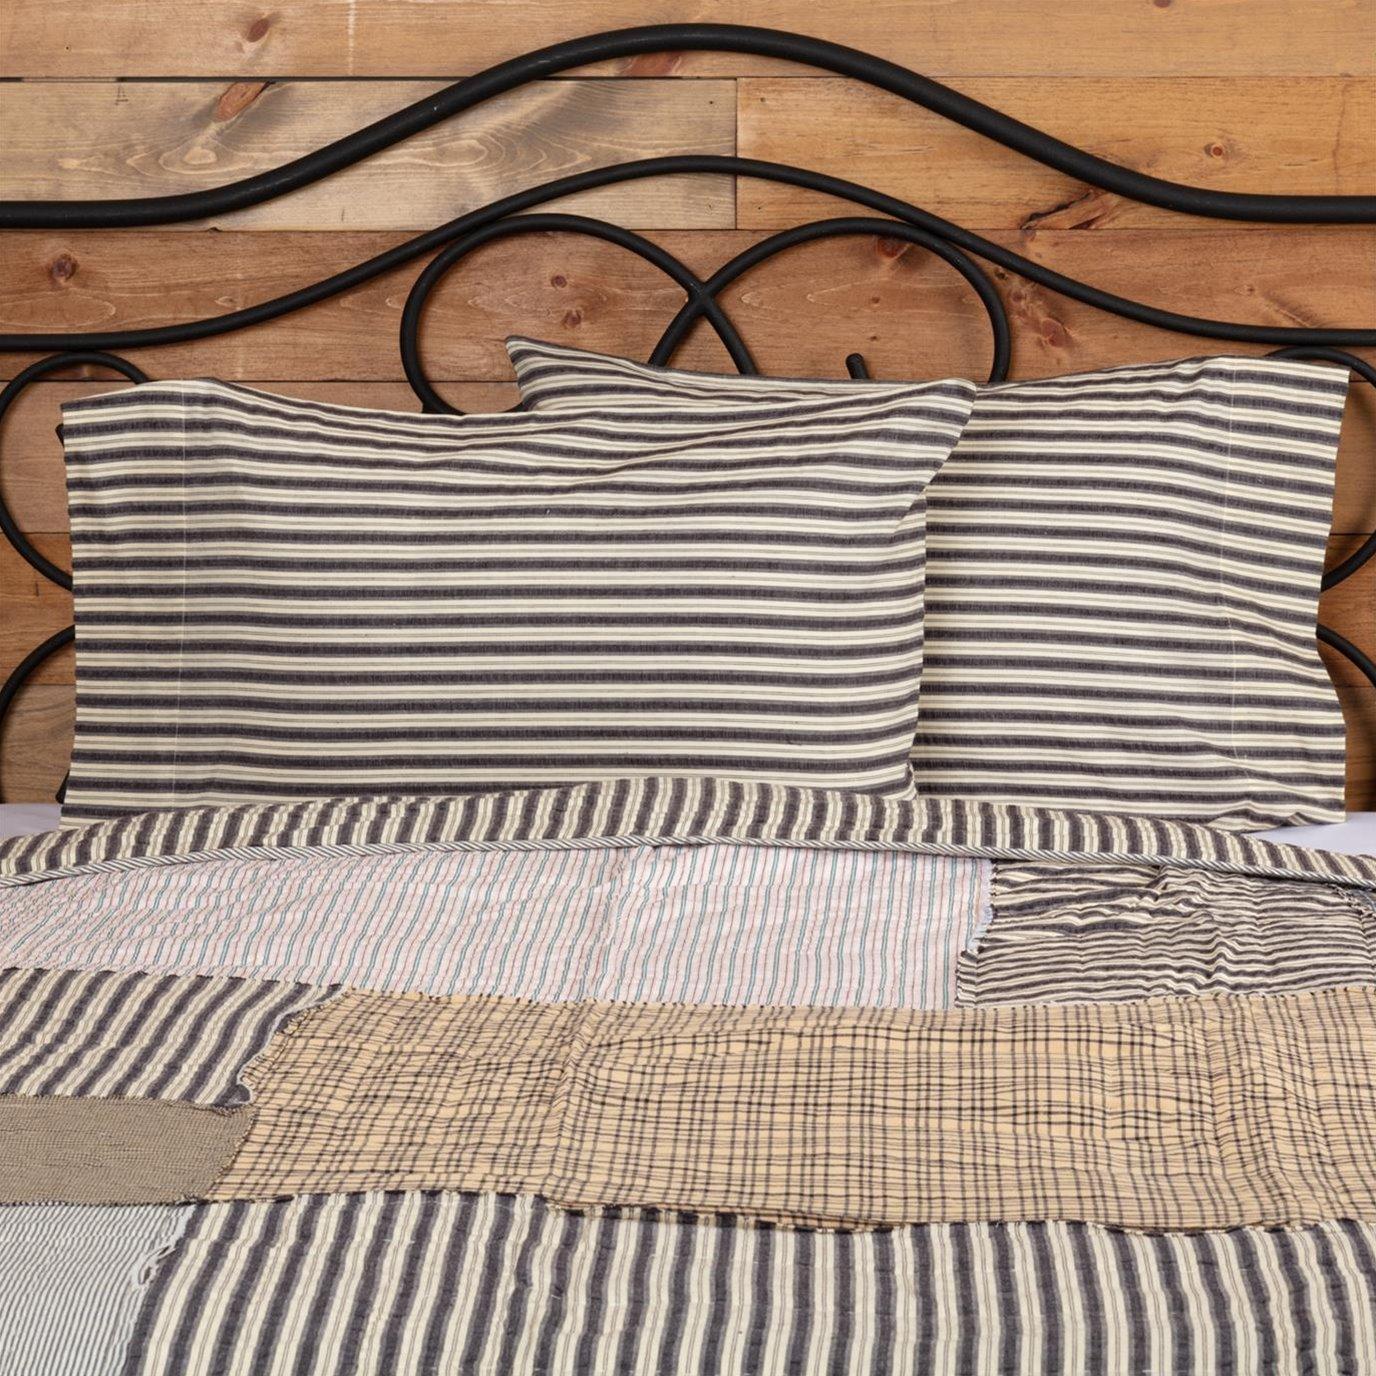 Ashmont Ticking Stripe Standard Pillow Case Set of 2 21x30